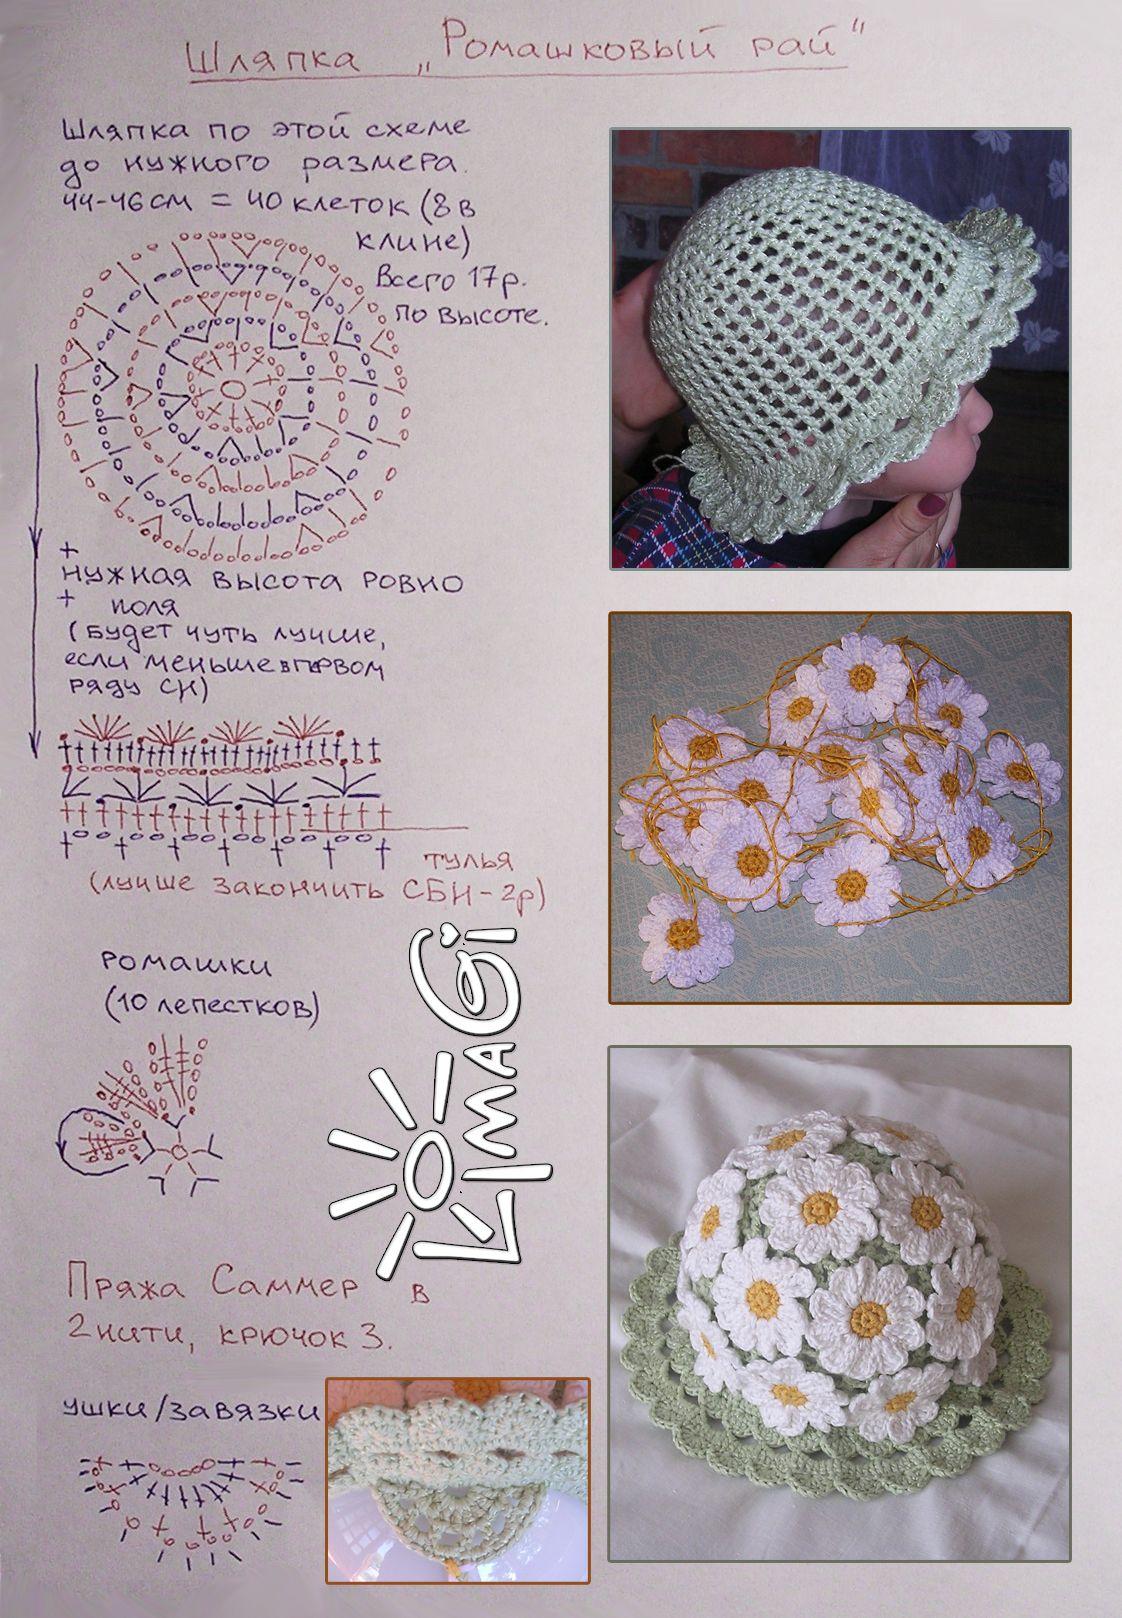 Flower sombreritos with diagram ♥♥♥♥ | crochete hat | Pinterest ...